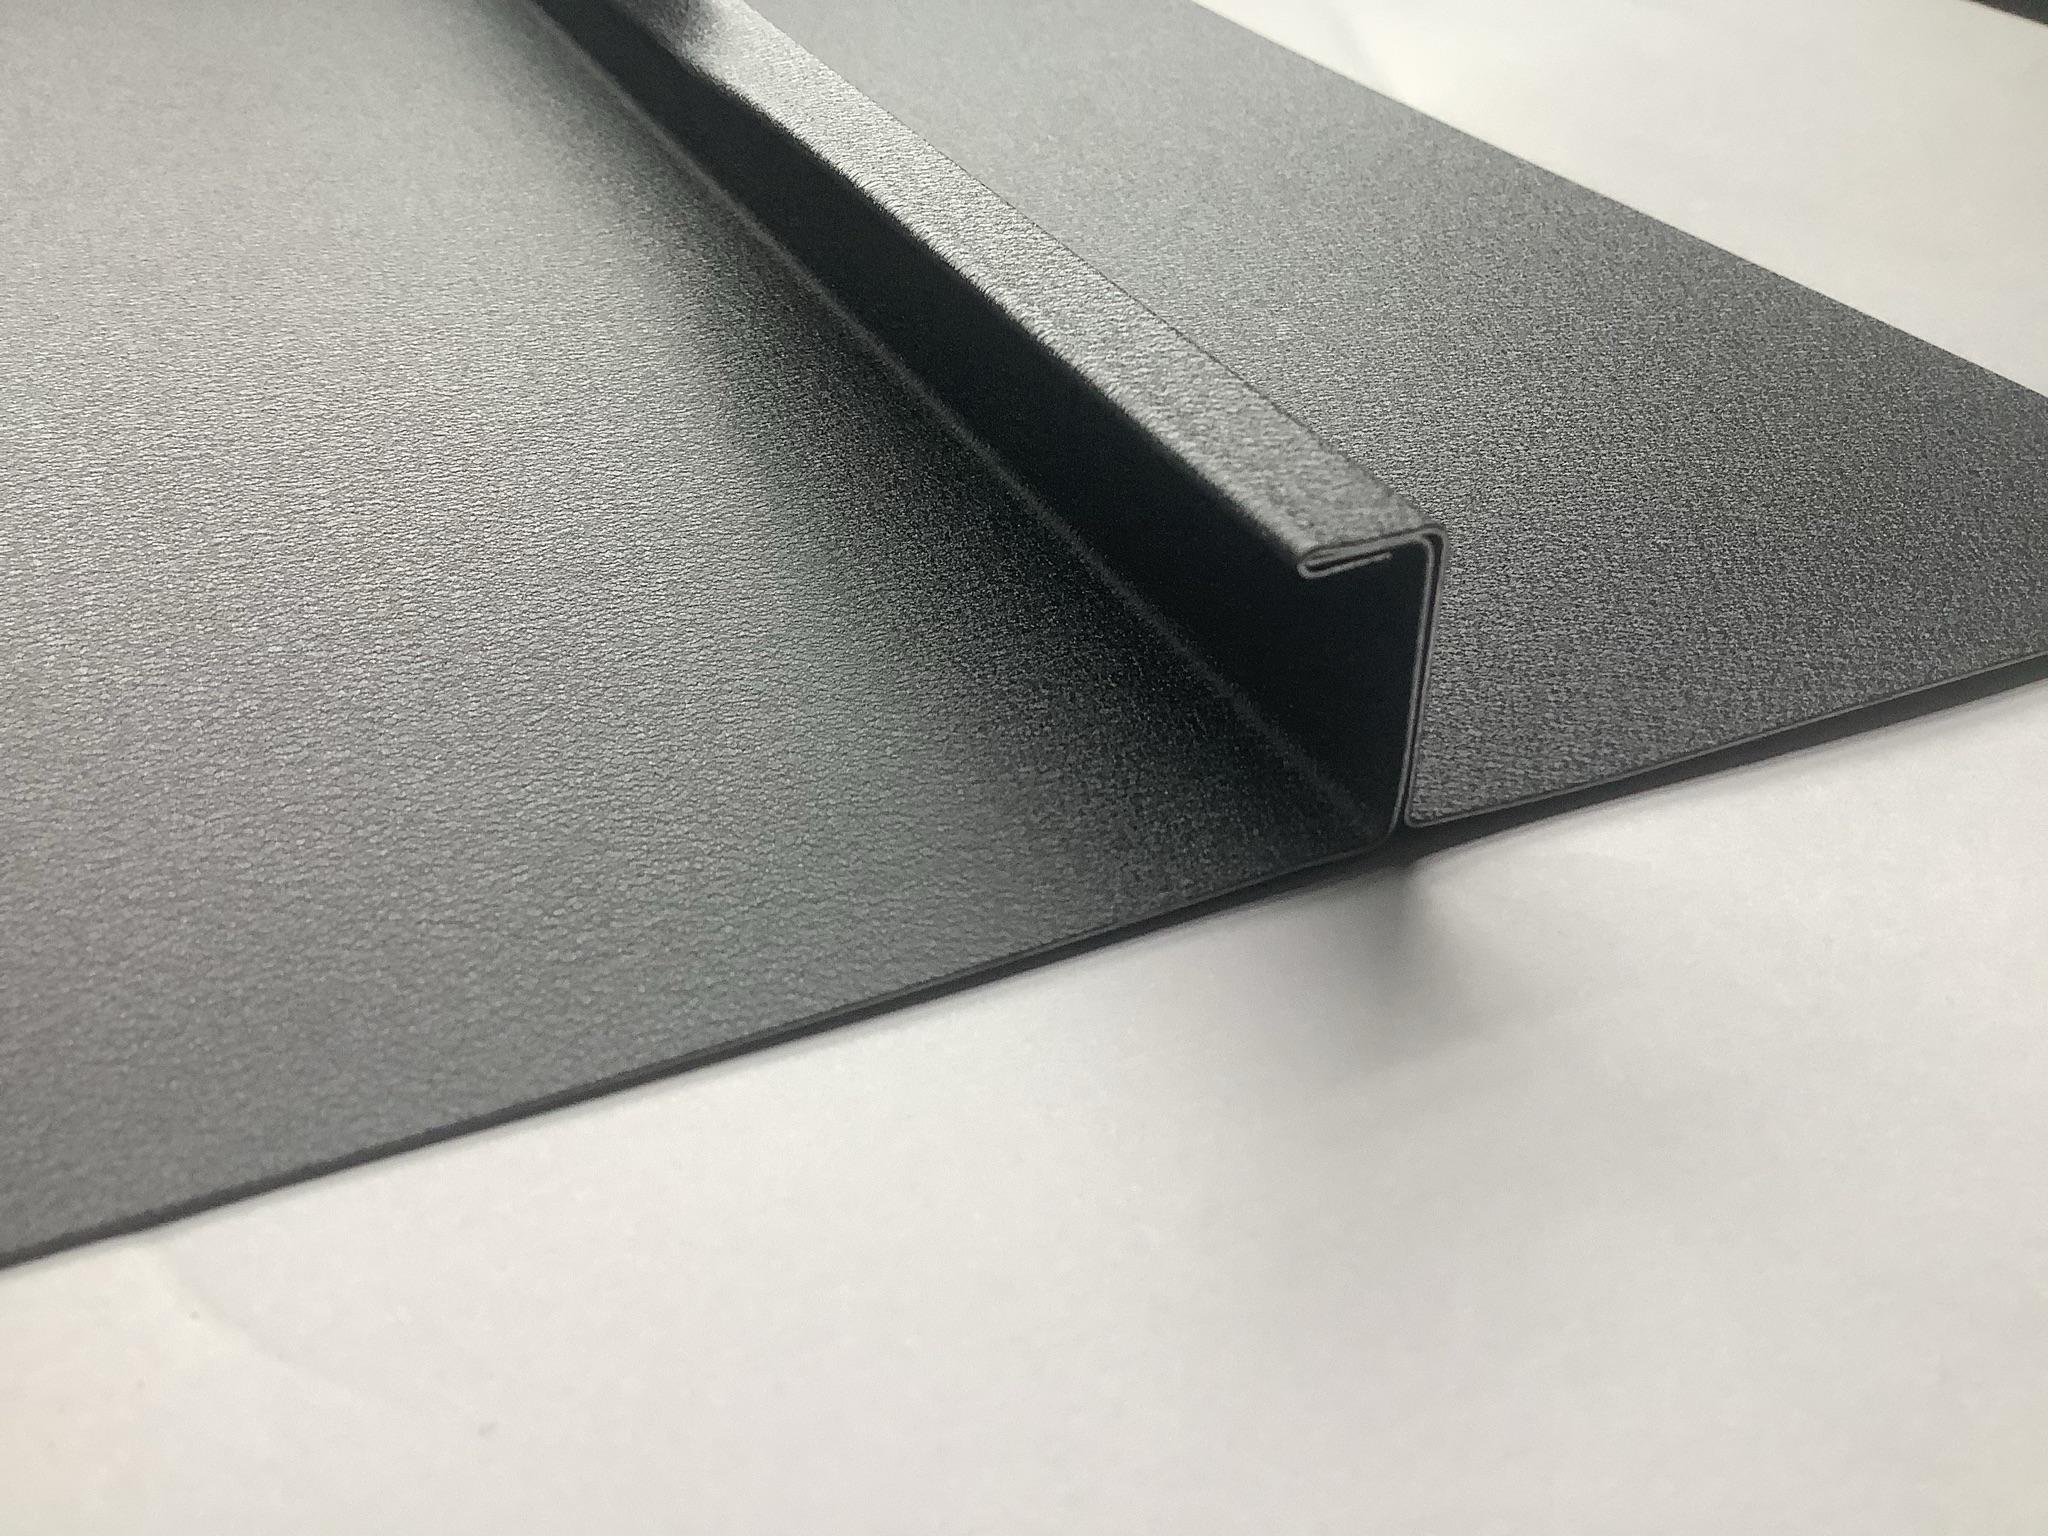 Mycelipan® TSS – 25mm x 530mm Standing Seam Panels – Greencoat PLX Pural BT